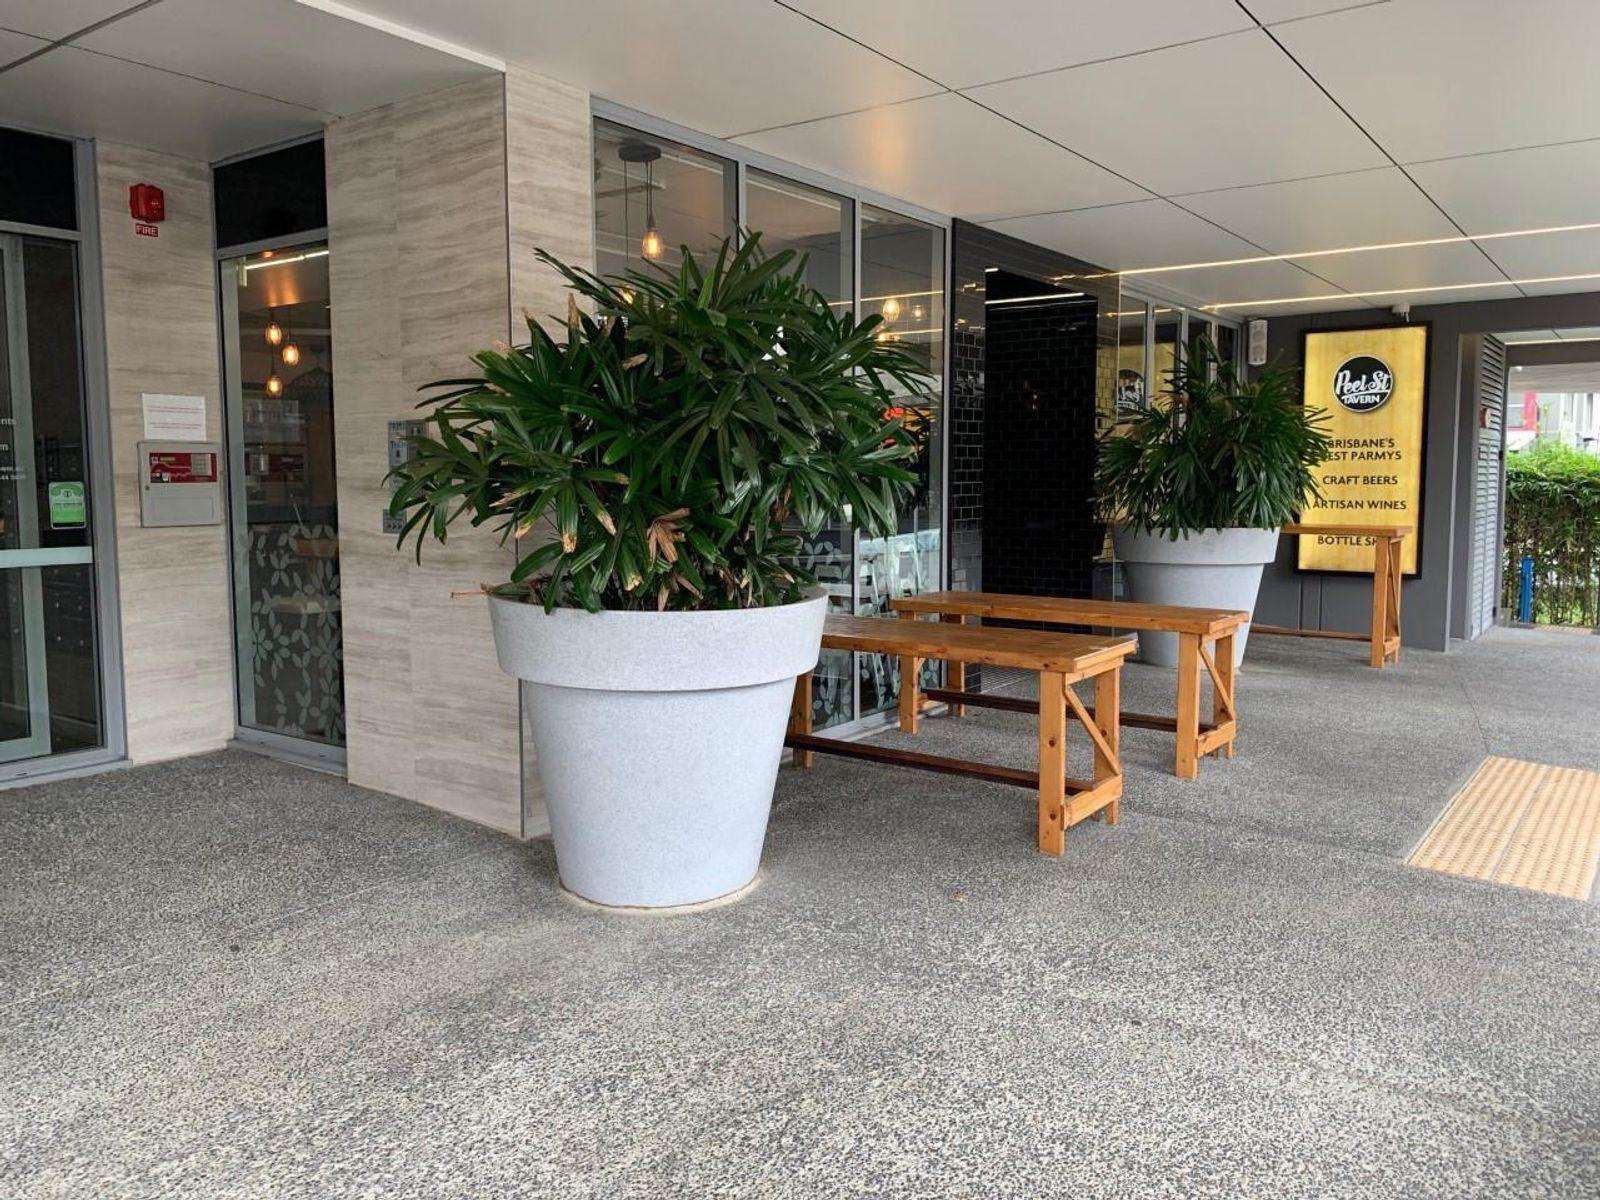 2.06/35 Peel Street, South Brisbane, QLD 4101